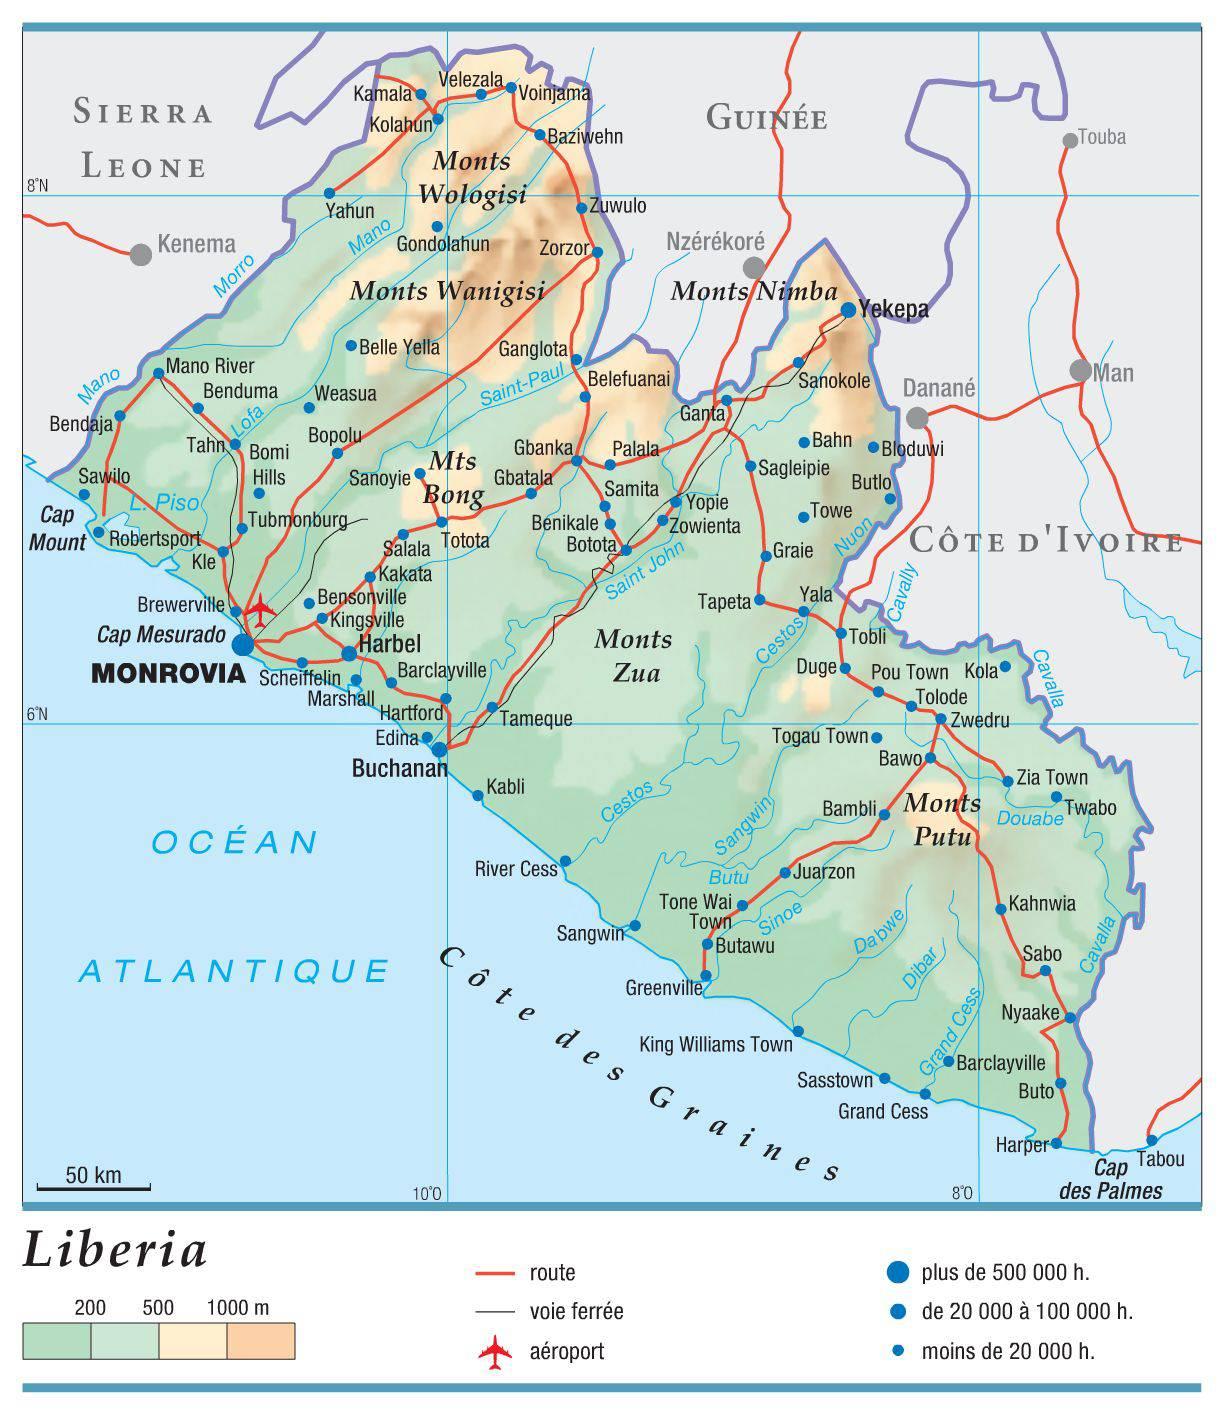 Carte du Liberia